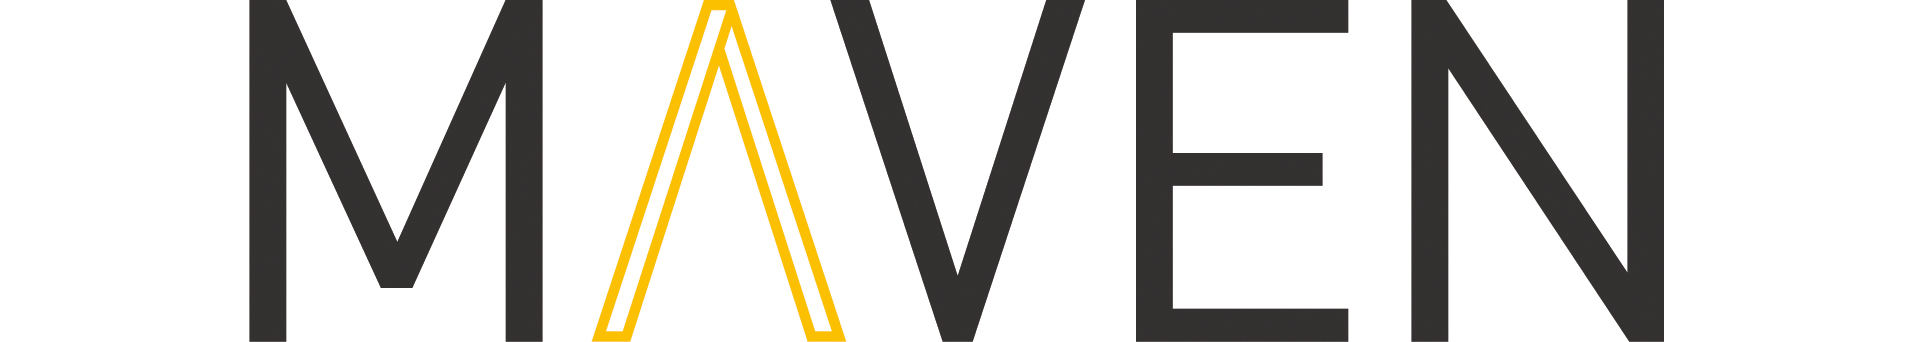 Maven_Logo.jpg